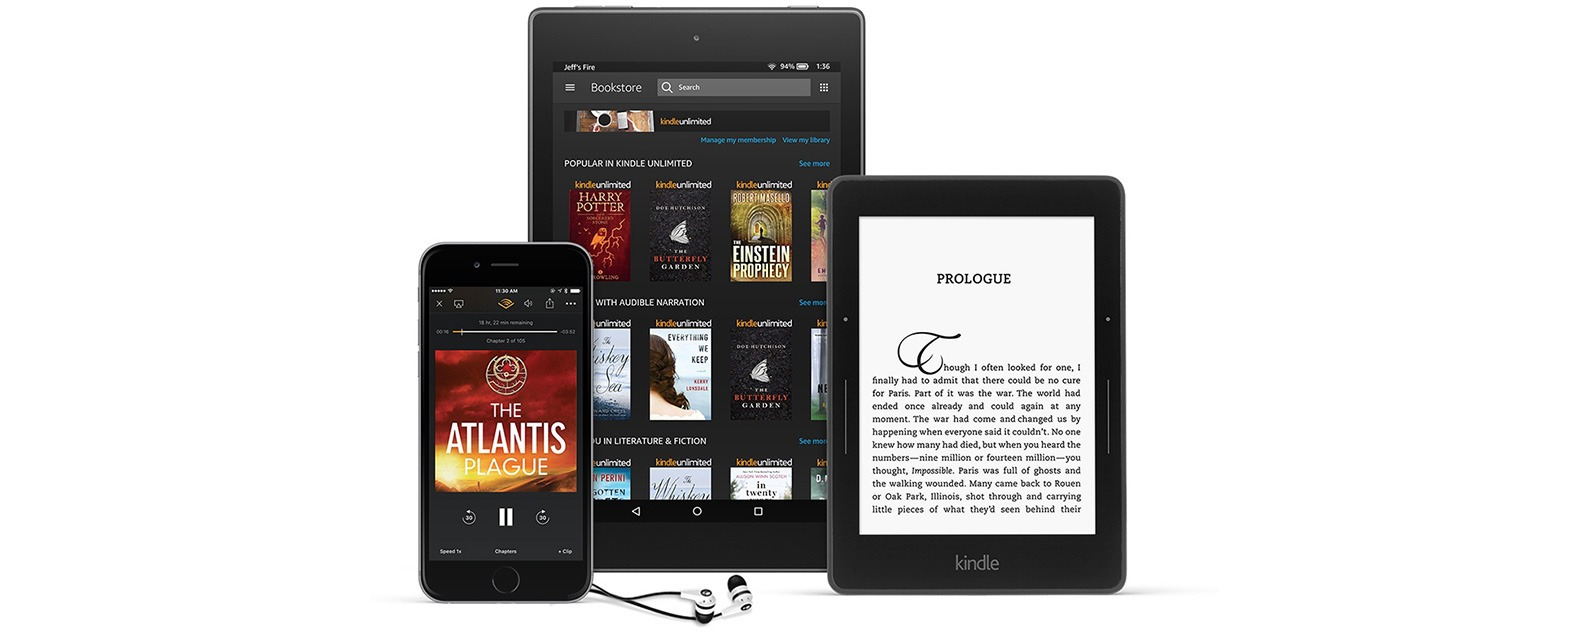 Ebook Onto Iphone